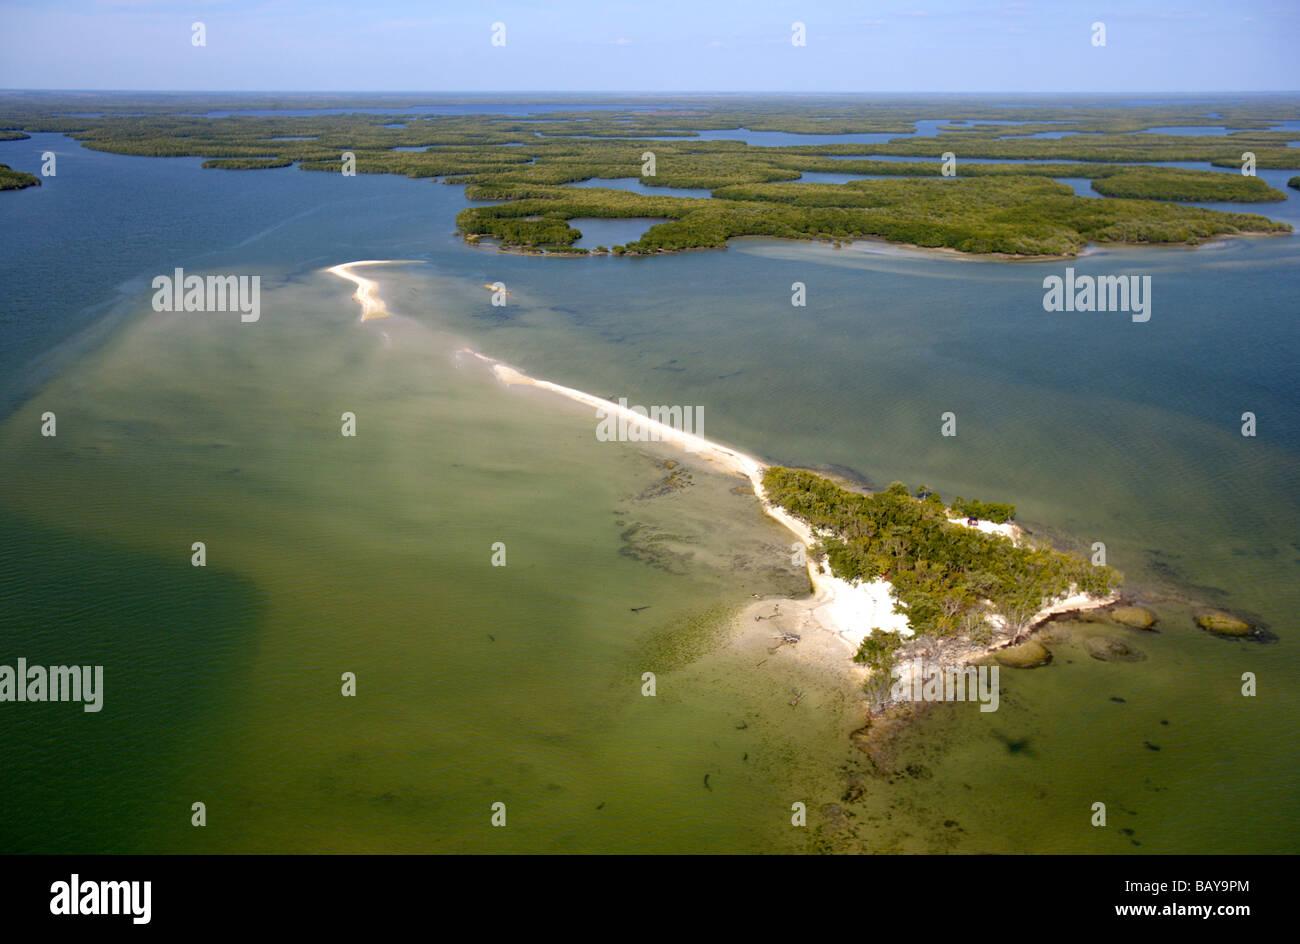 Aerial view of Ten Thousand Islands National Wildlife Refuge, Florida, USA - Stock Image